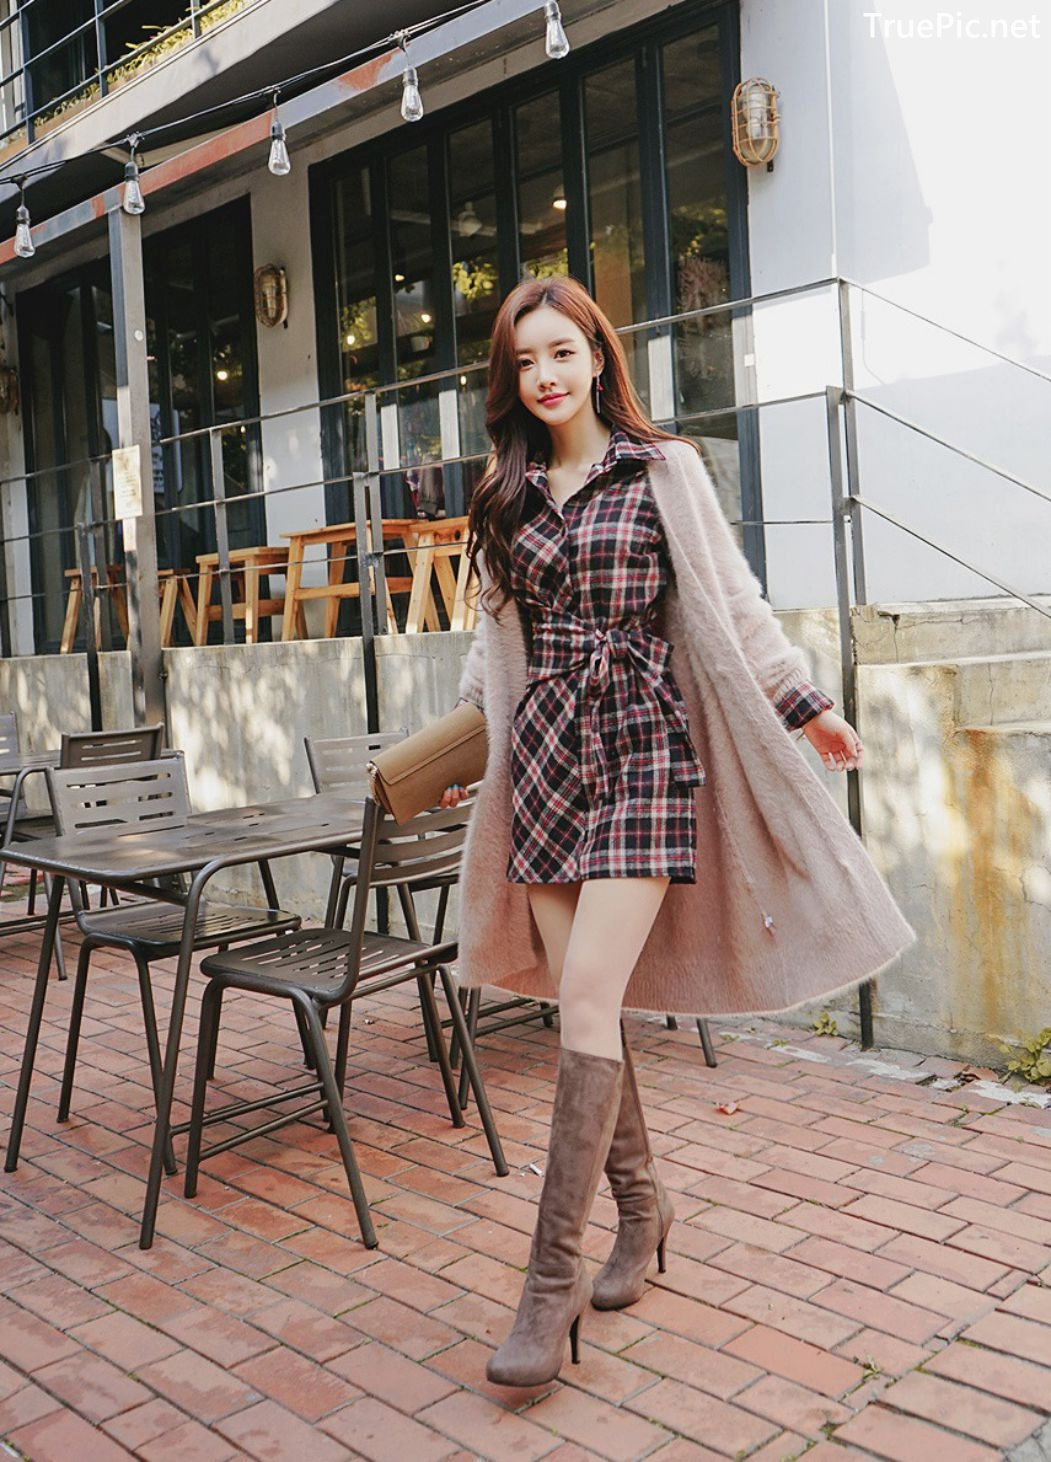 Image Son Yoon Joo Beautiful Photos – Korean Fashion Collection #3 - TruePic.net - Picture-7